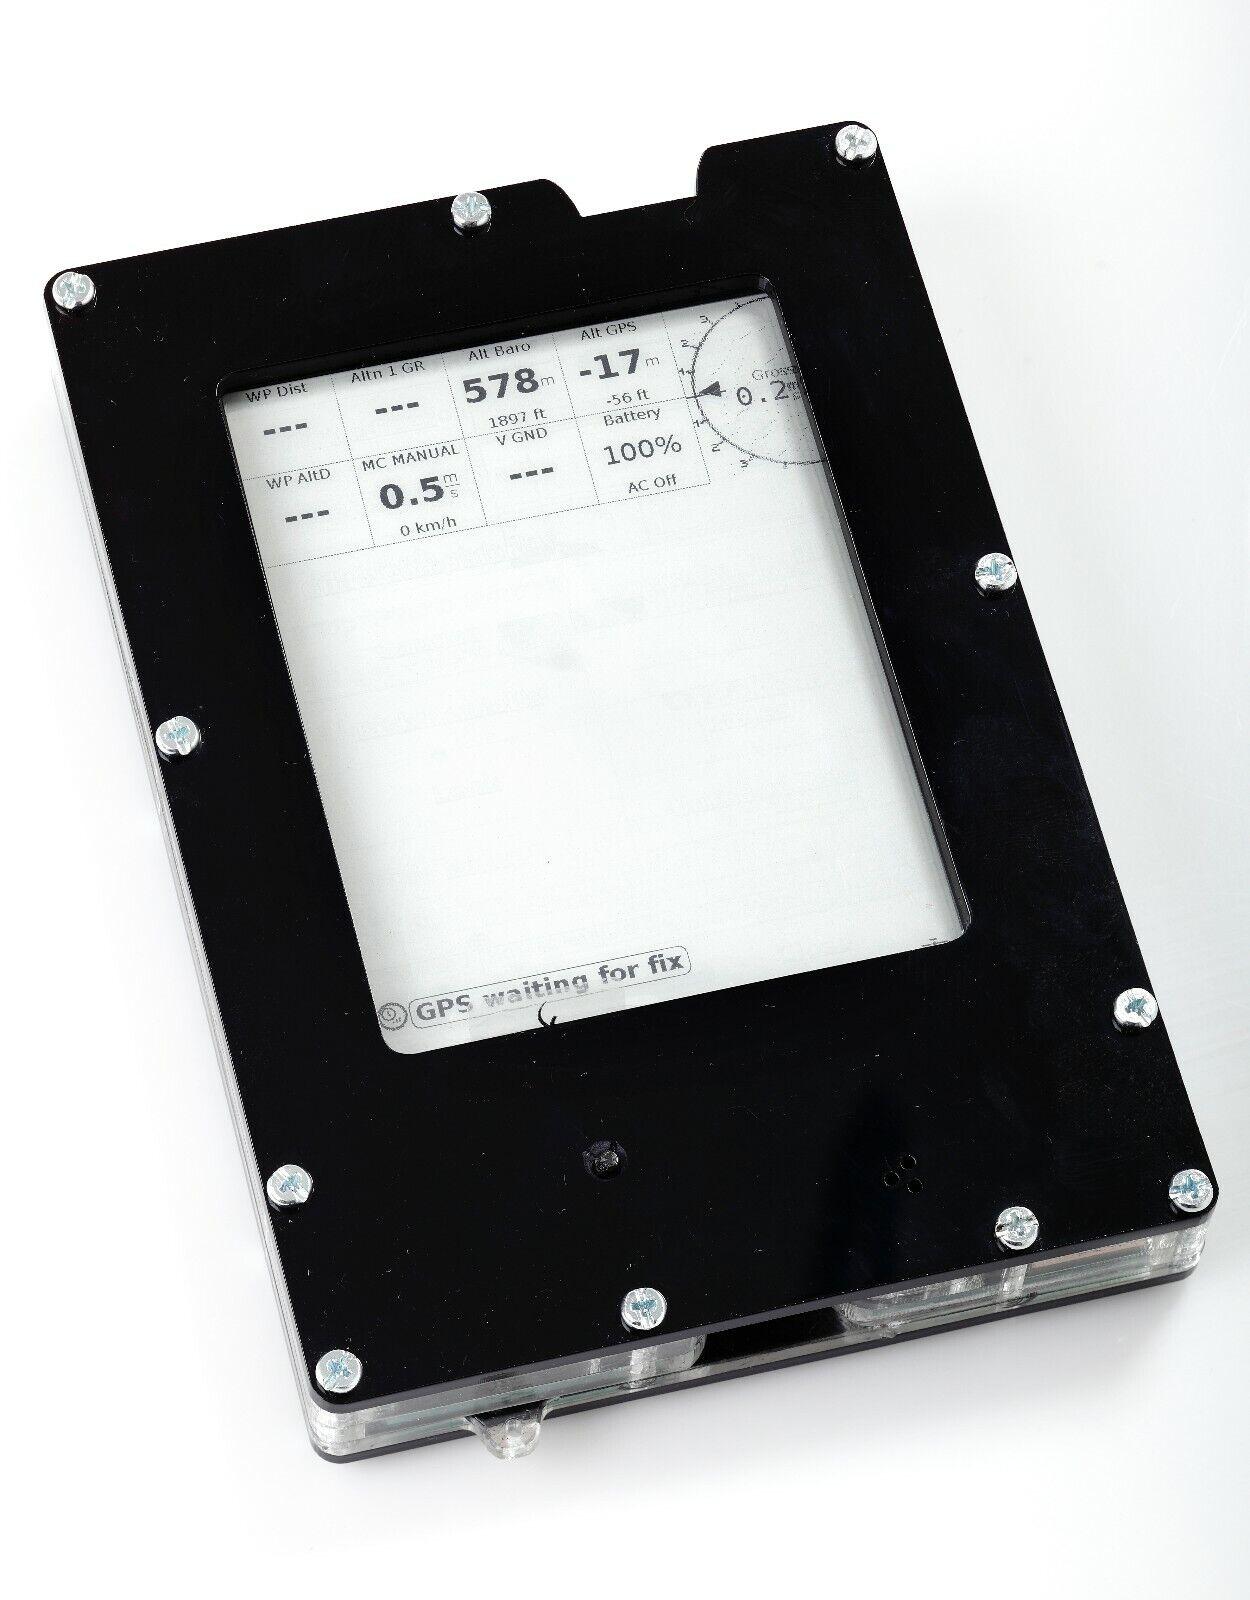 KOBO Mini, with XCSoar or LK8000, Vario, GPS, Barometric sensor, AUDIO, MAPS